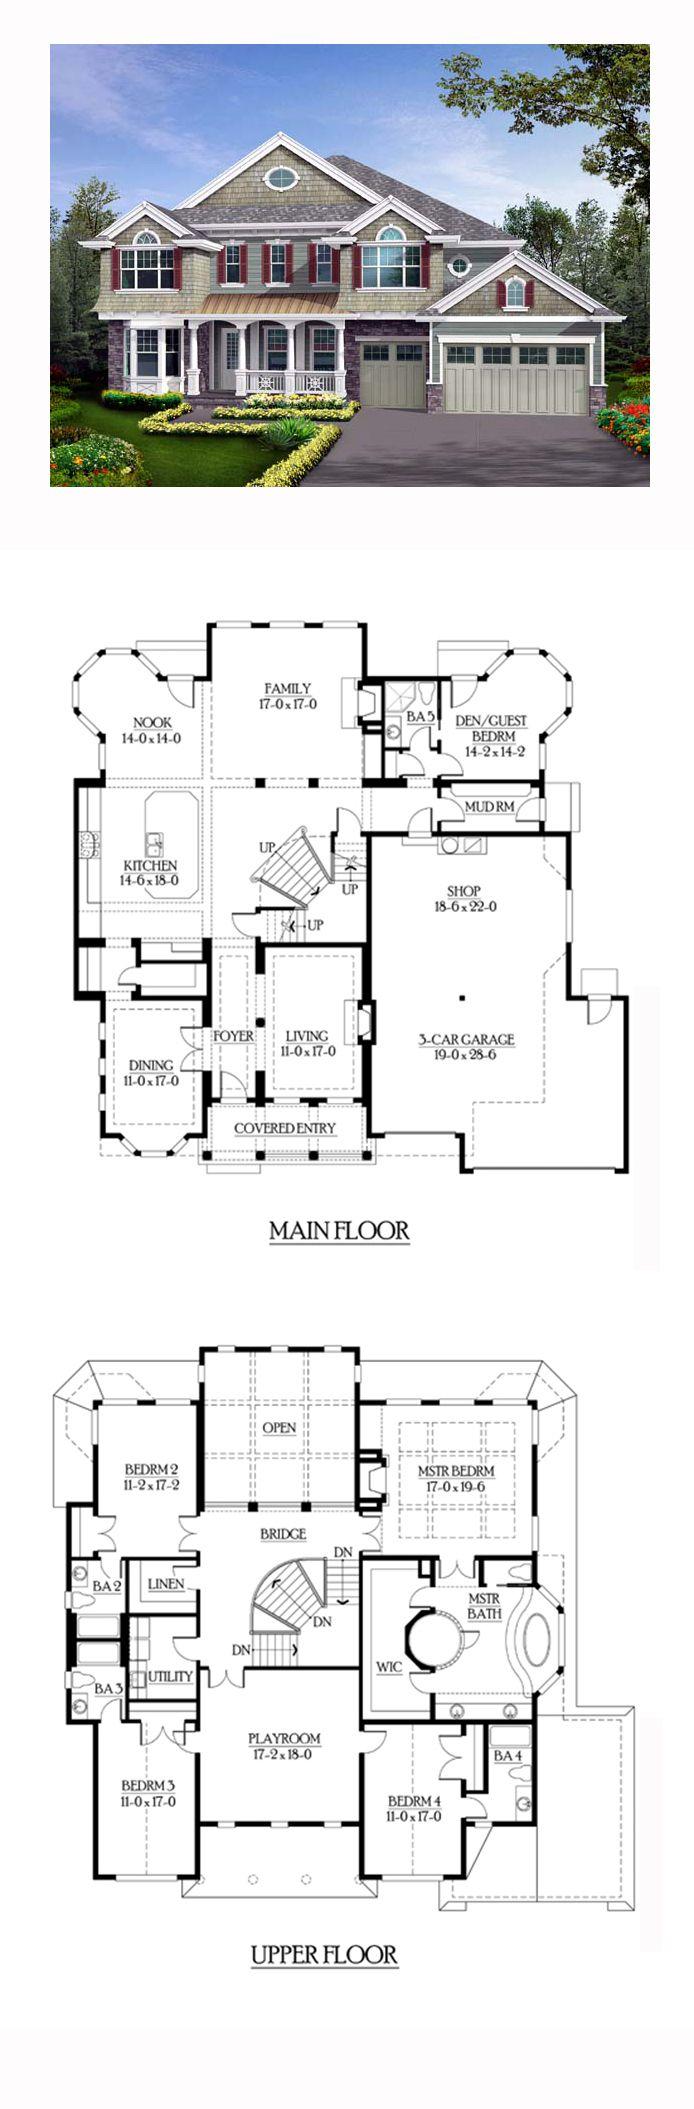 Best 25+ Floor plans ideas on Pinterest | House floor ...